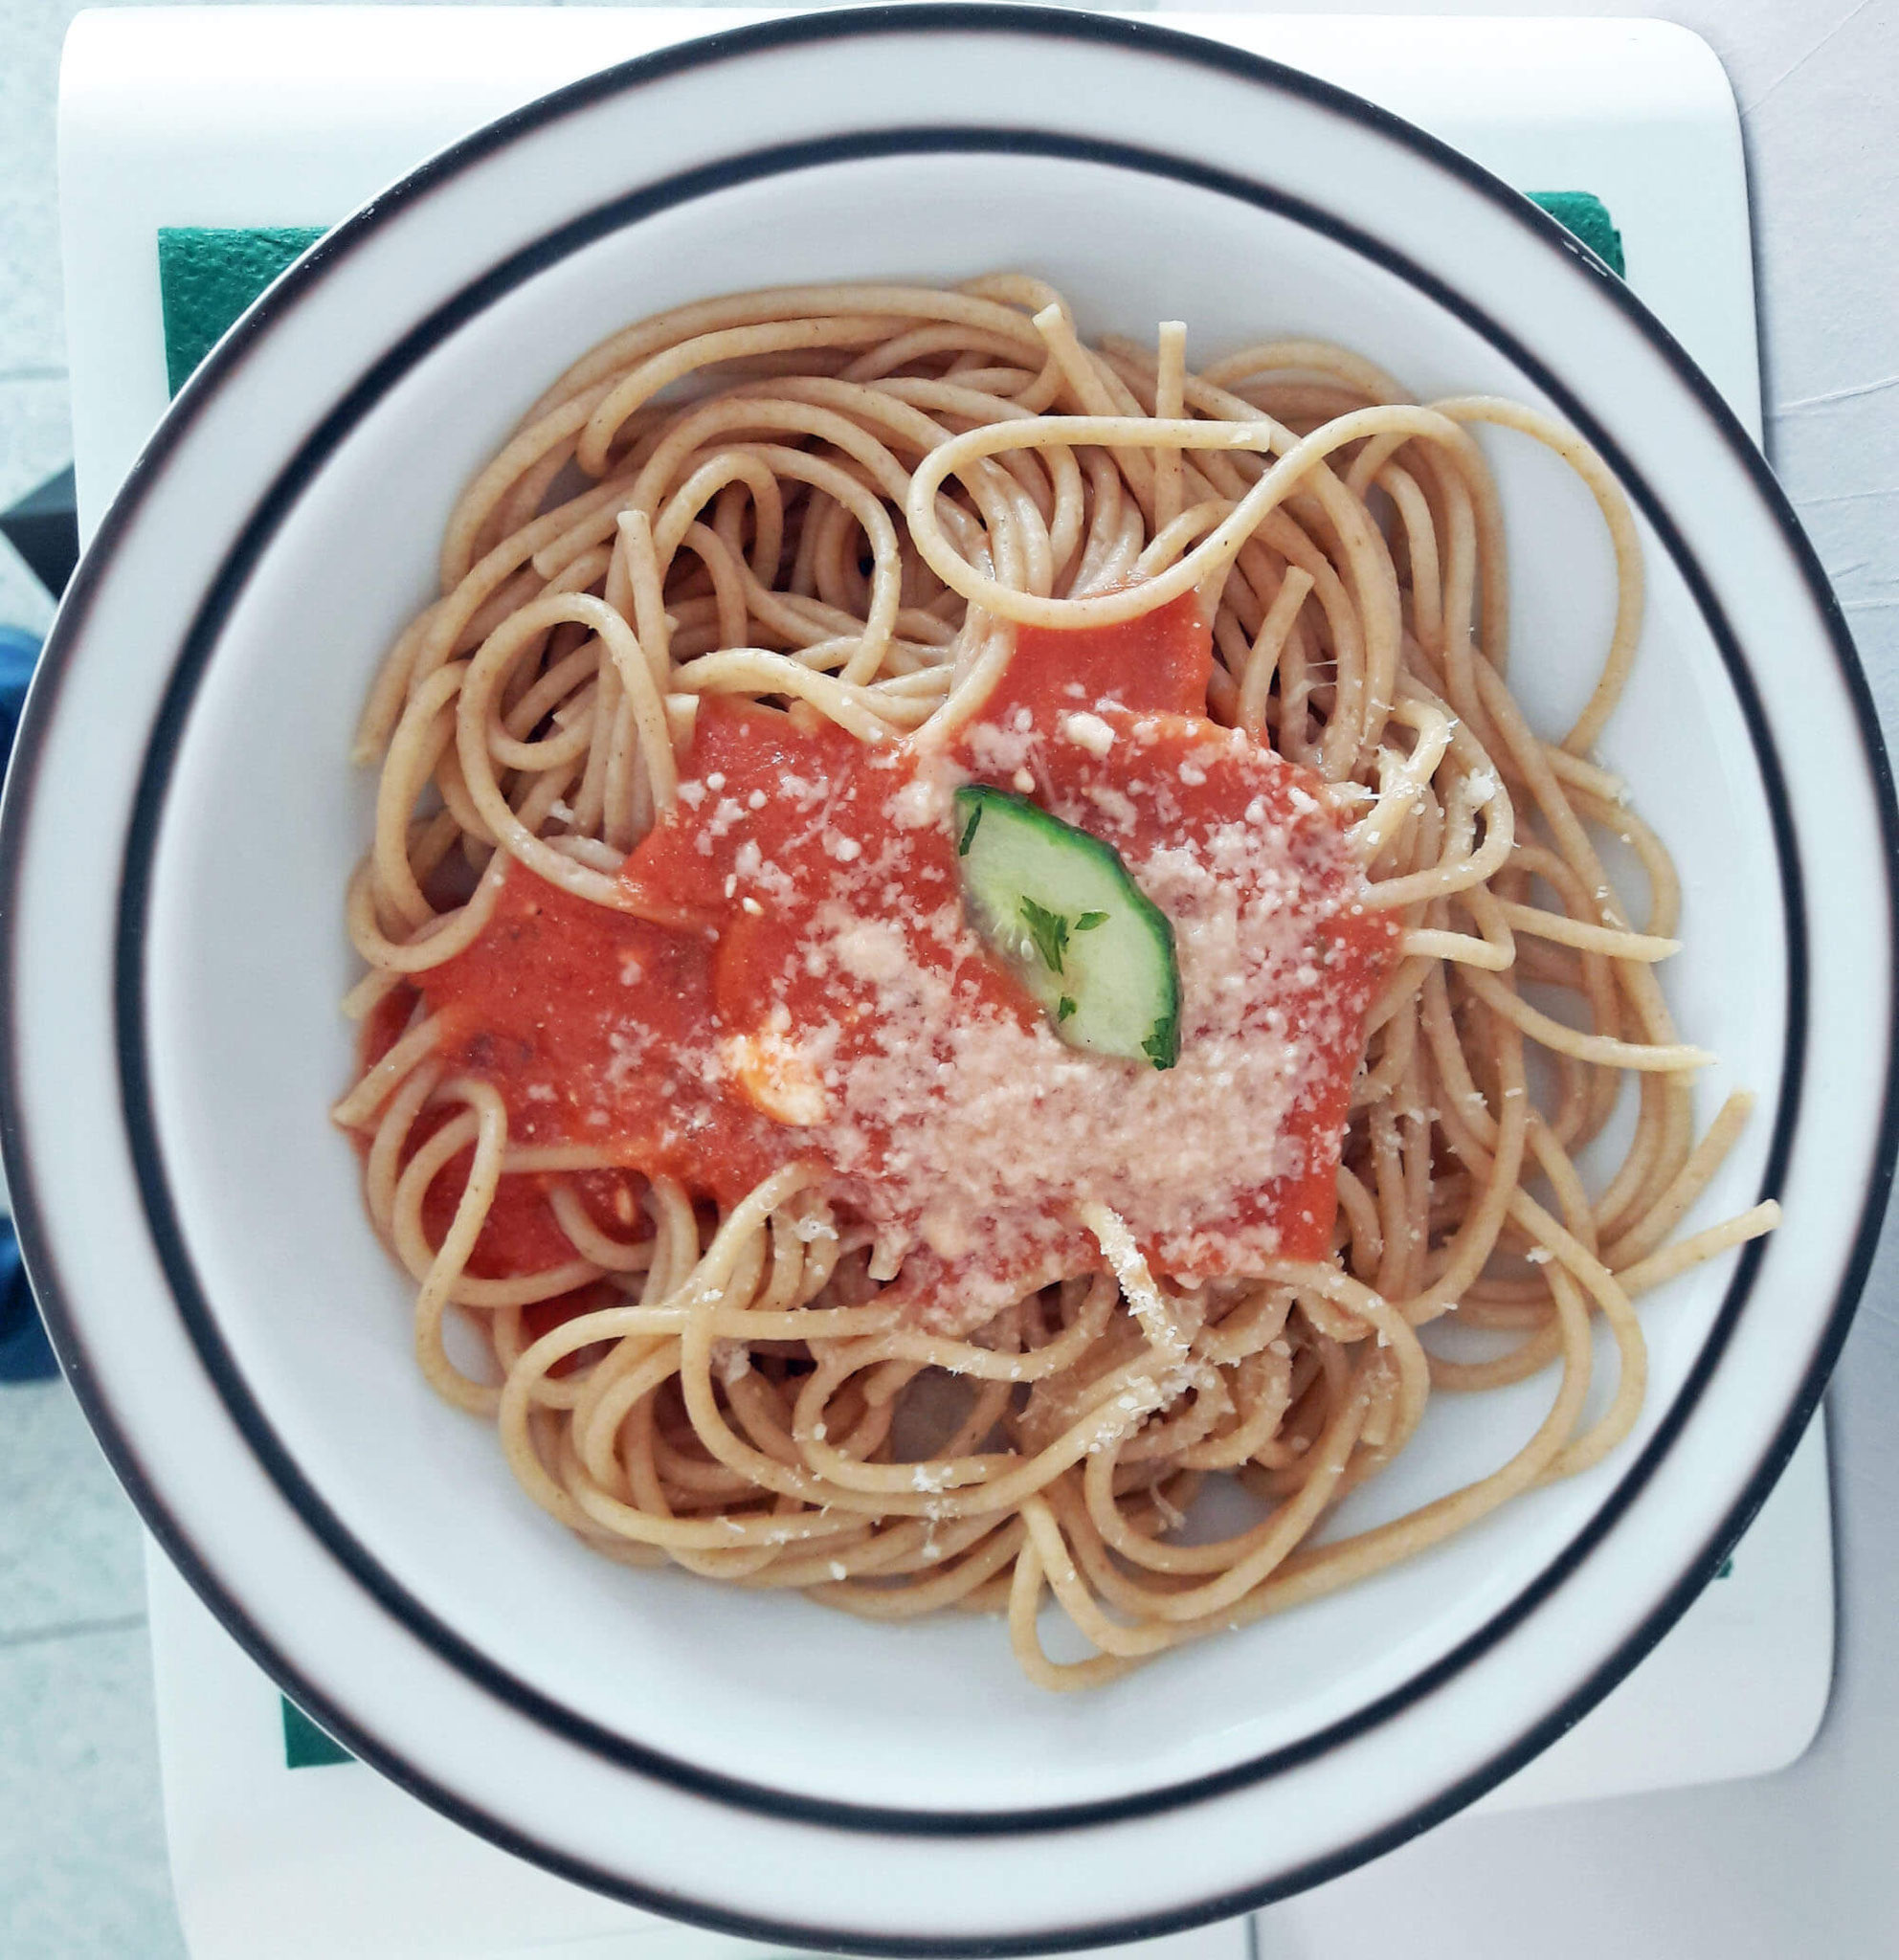 13b_Hauptspeise_Spaghetti, Ute Both